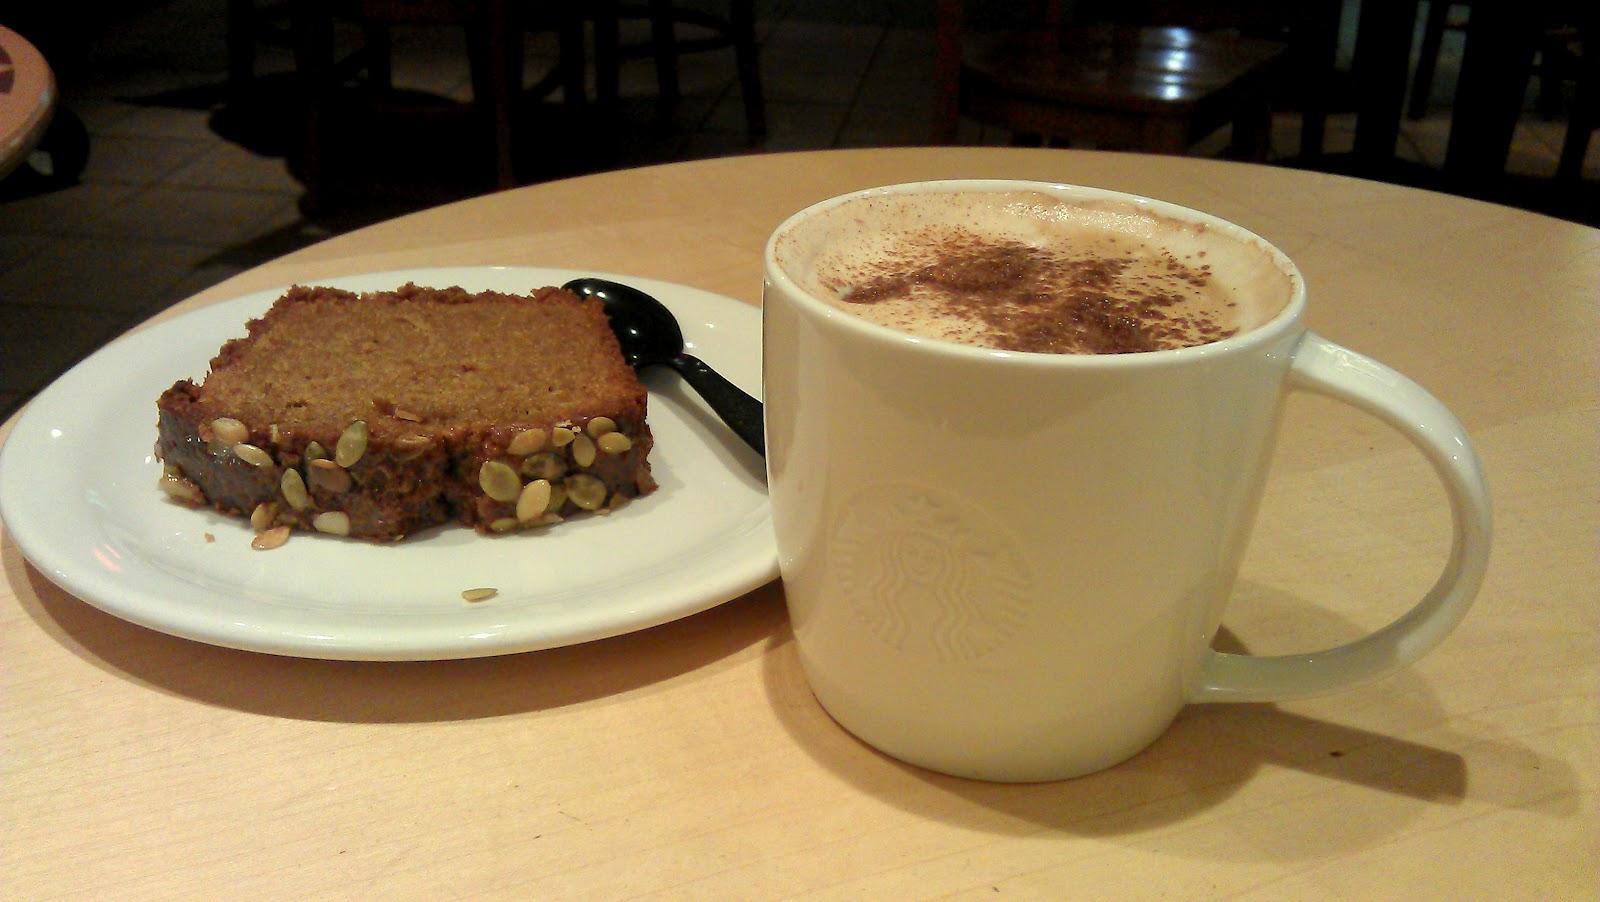 Grocery Gems: Starbucks Pumpkin Spice Latte & Salted Caramel Mocha